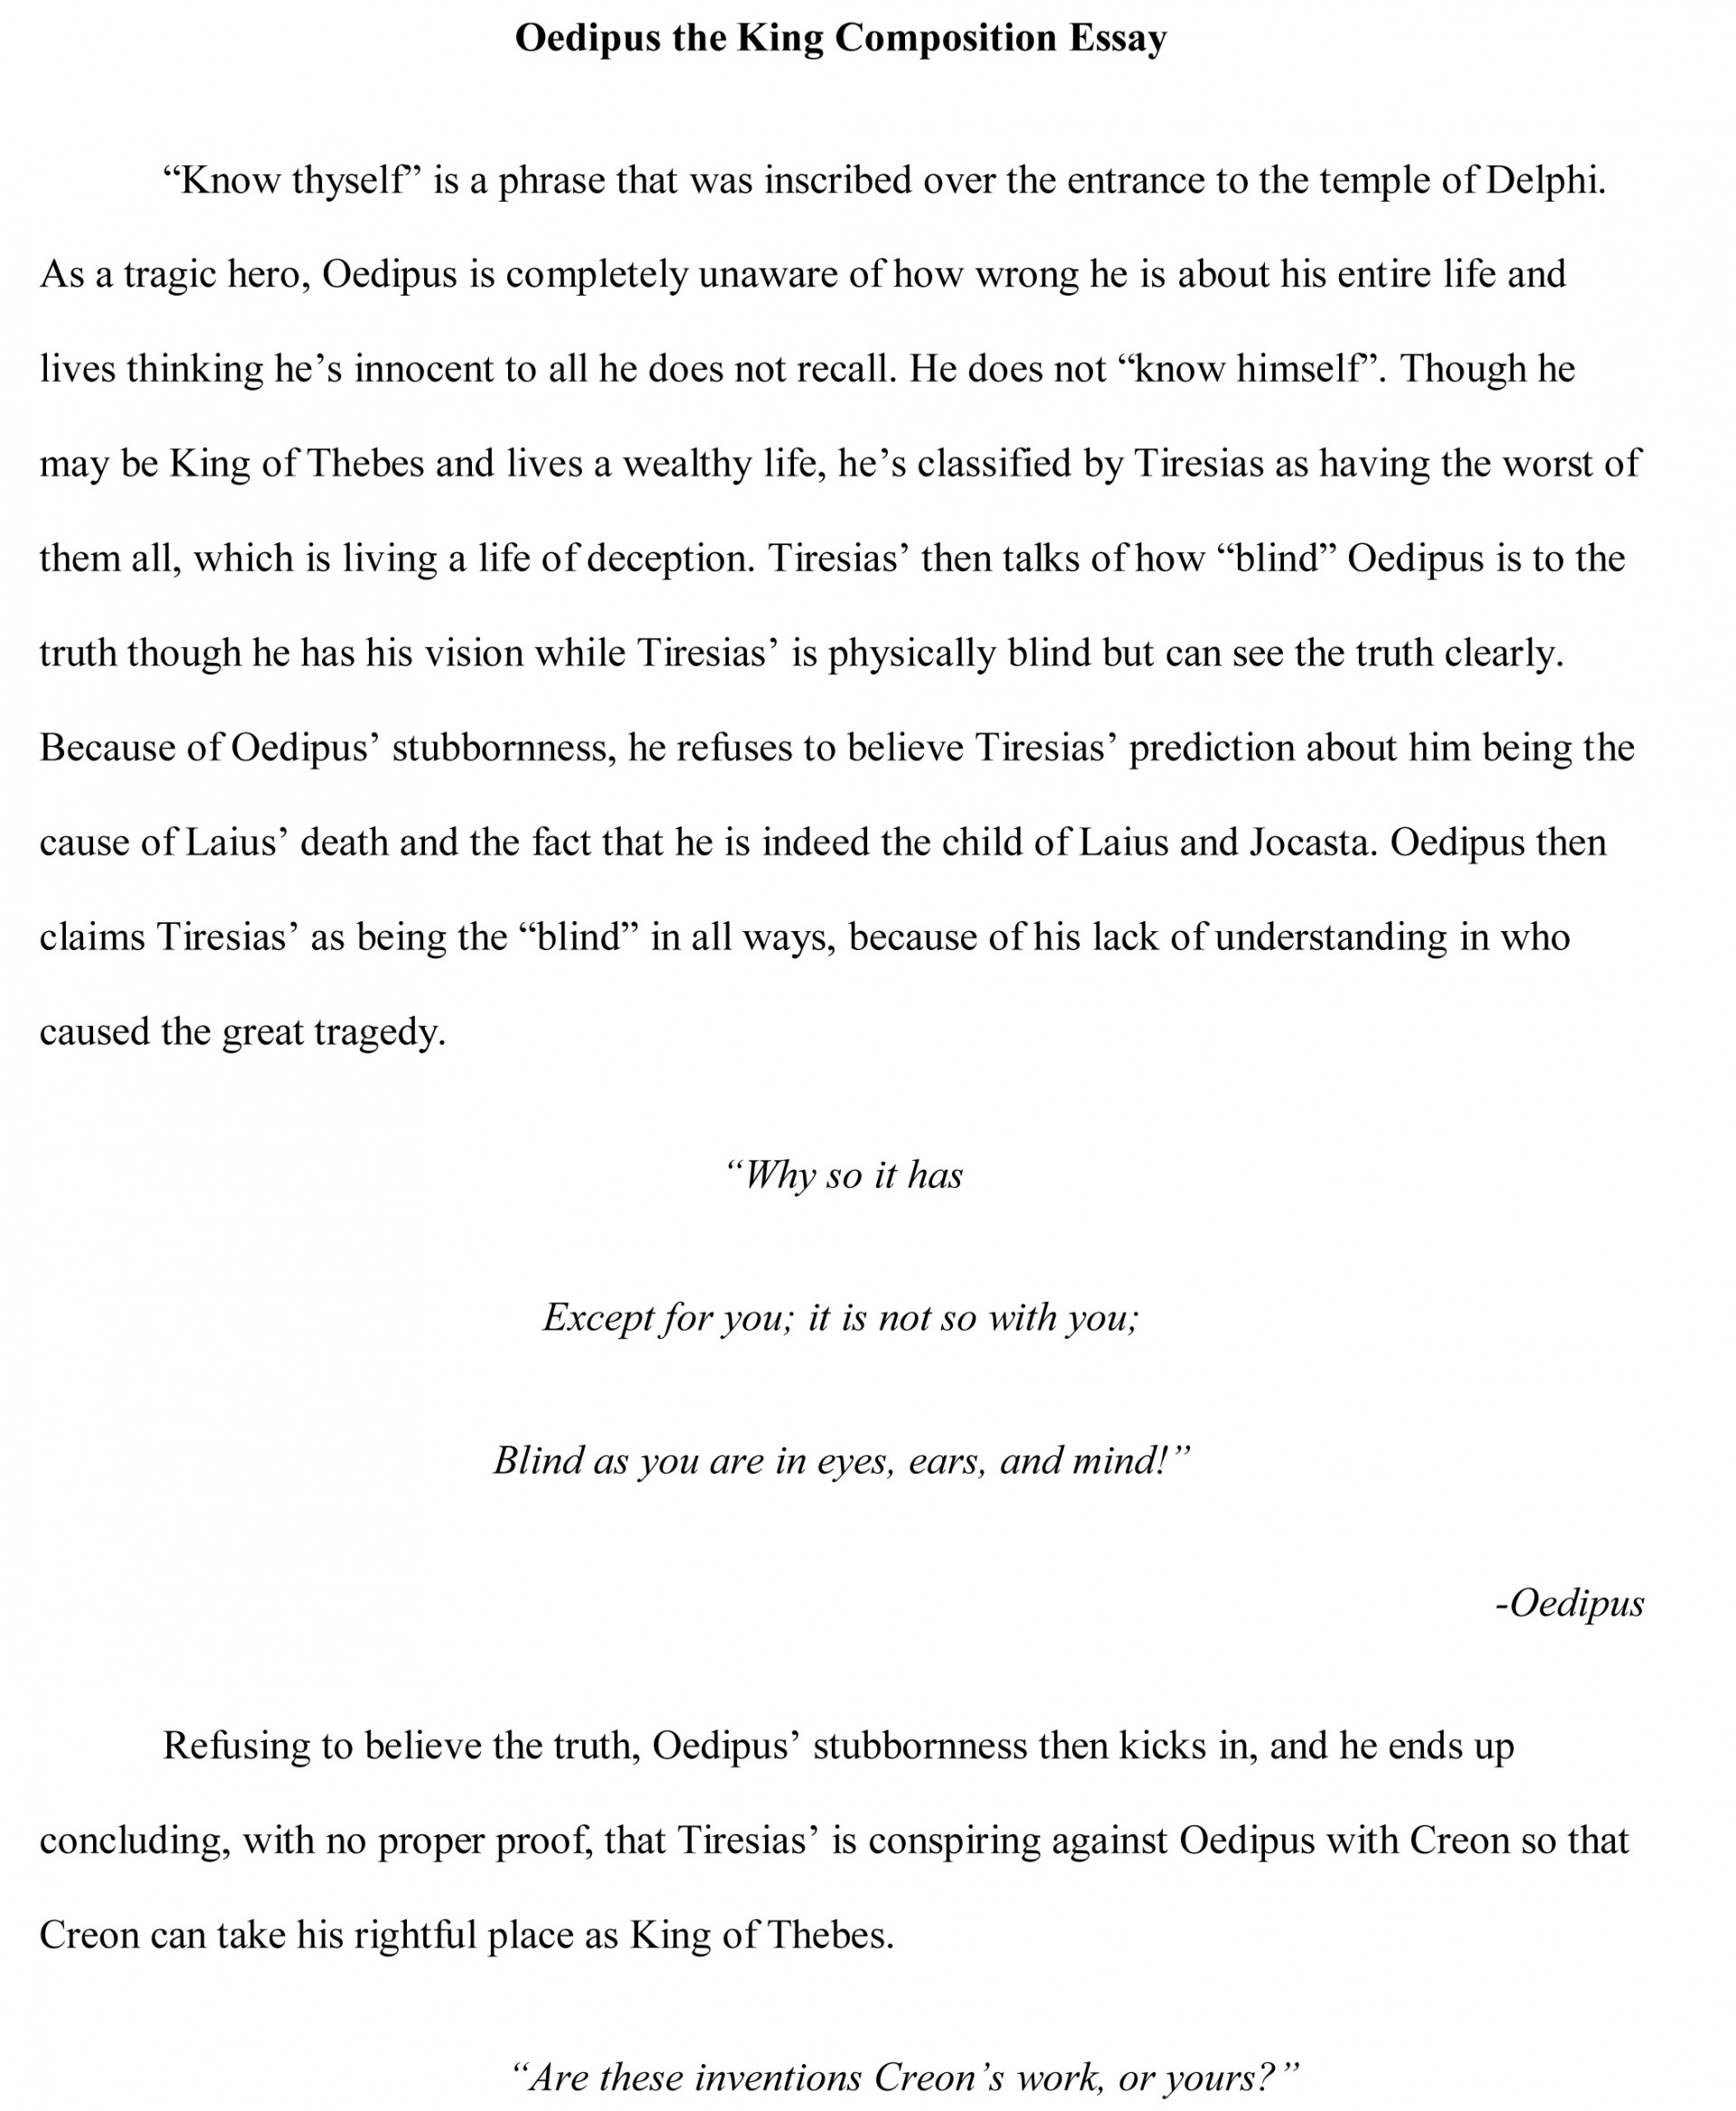 007 Best Essays Oedipus Essay Free Sample Breathtaking 2016 Personal College Australian 1920